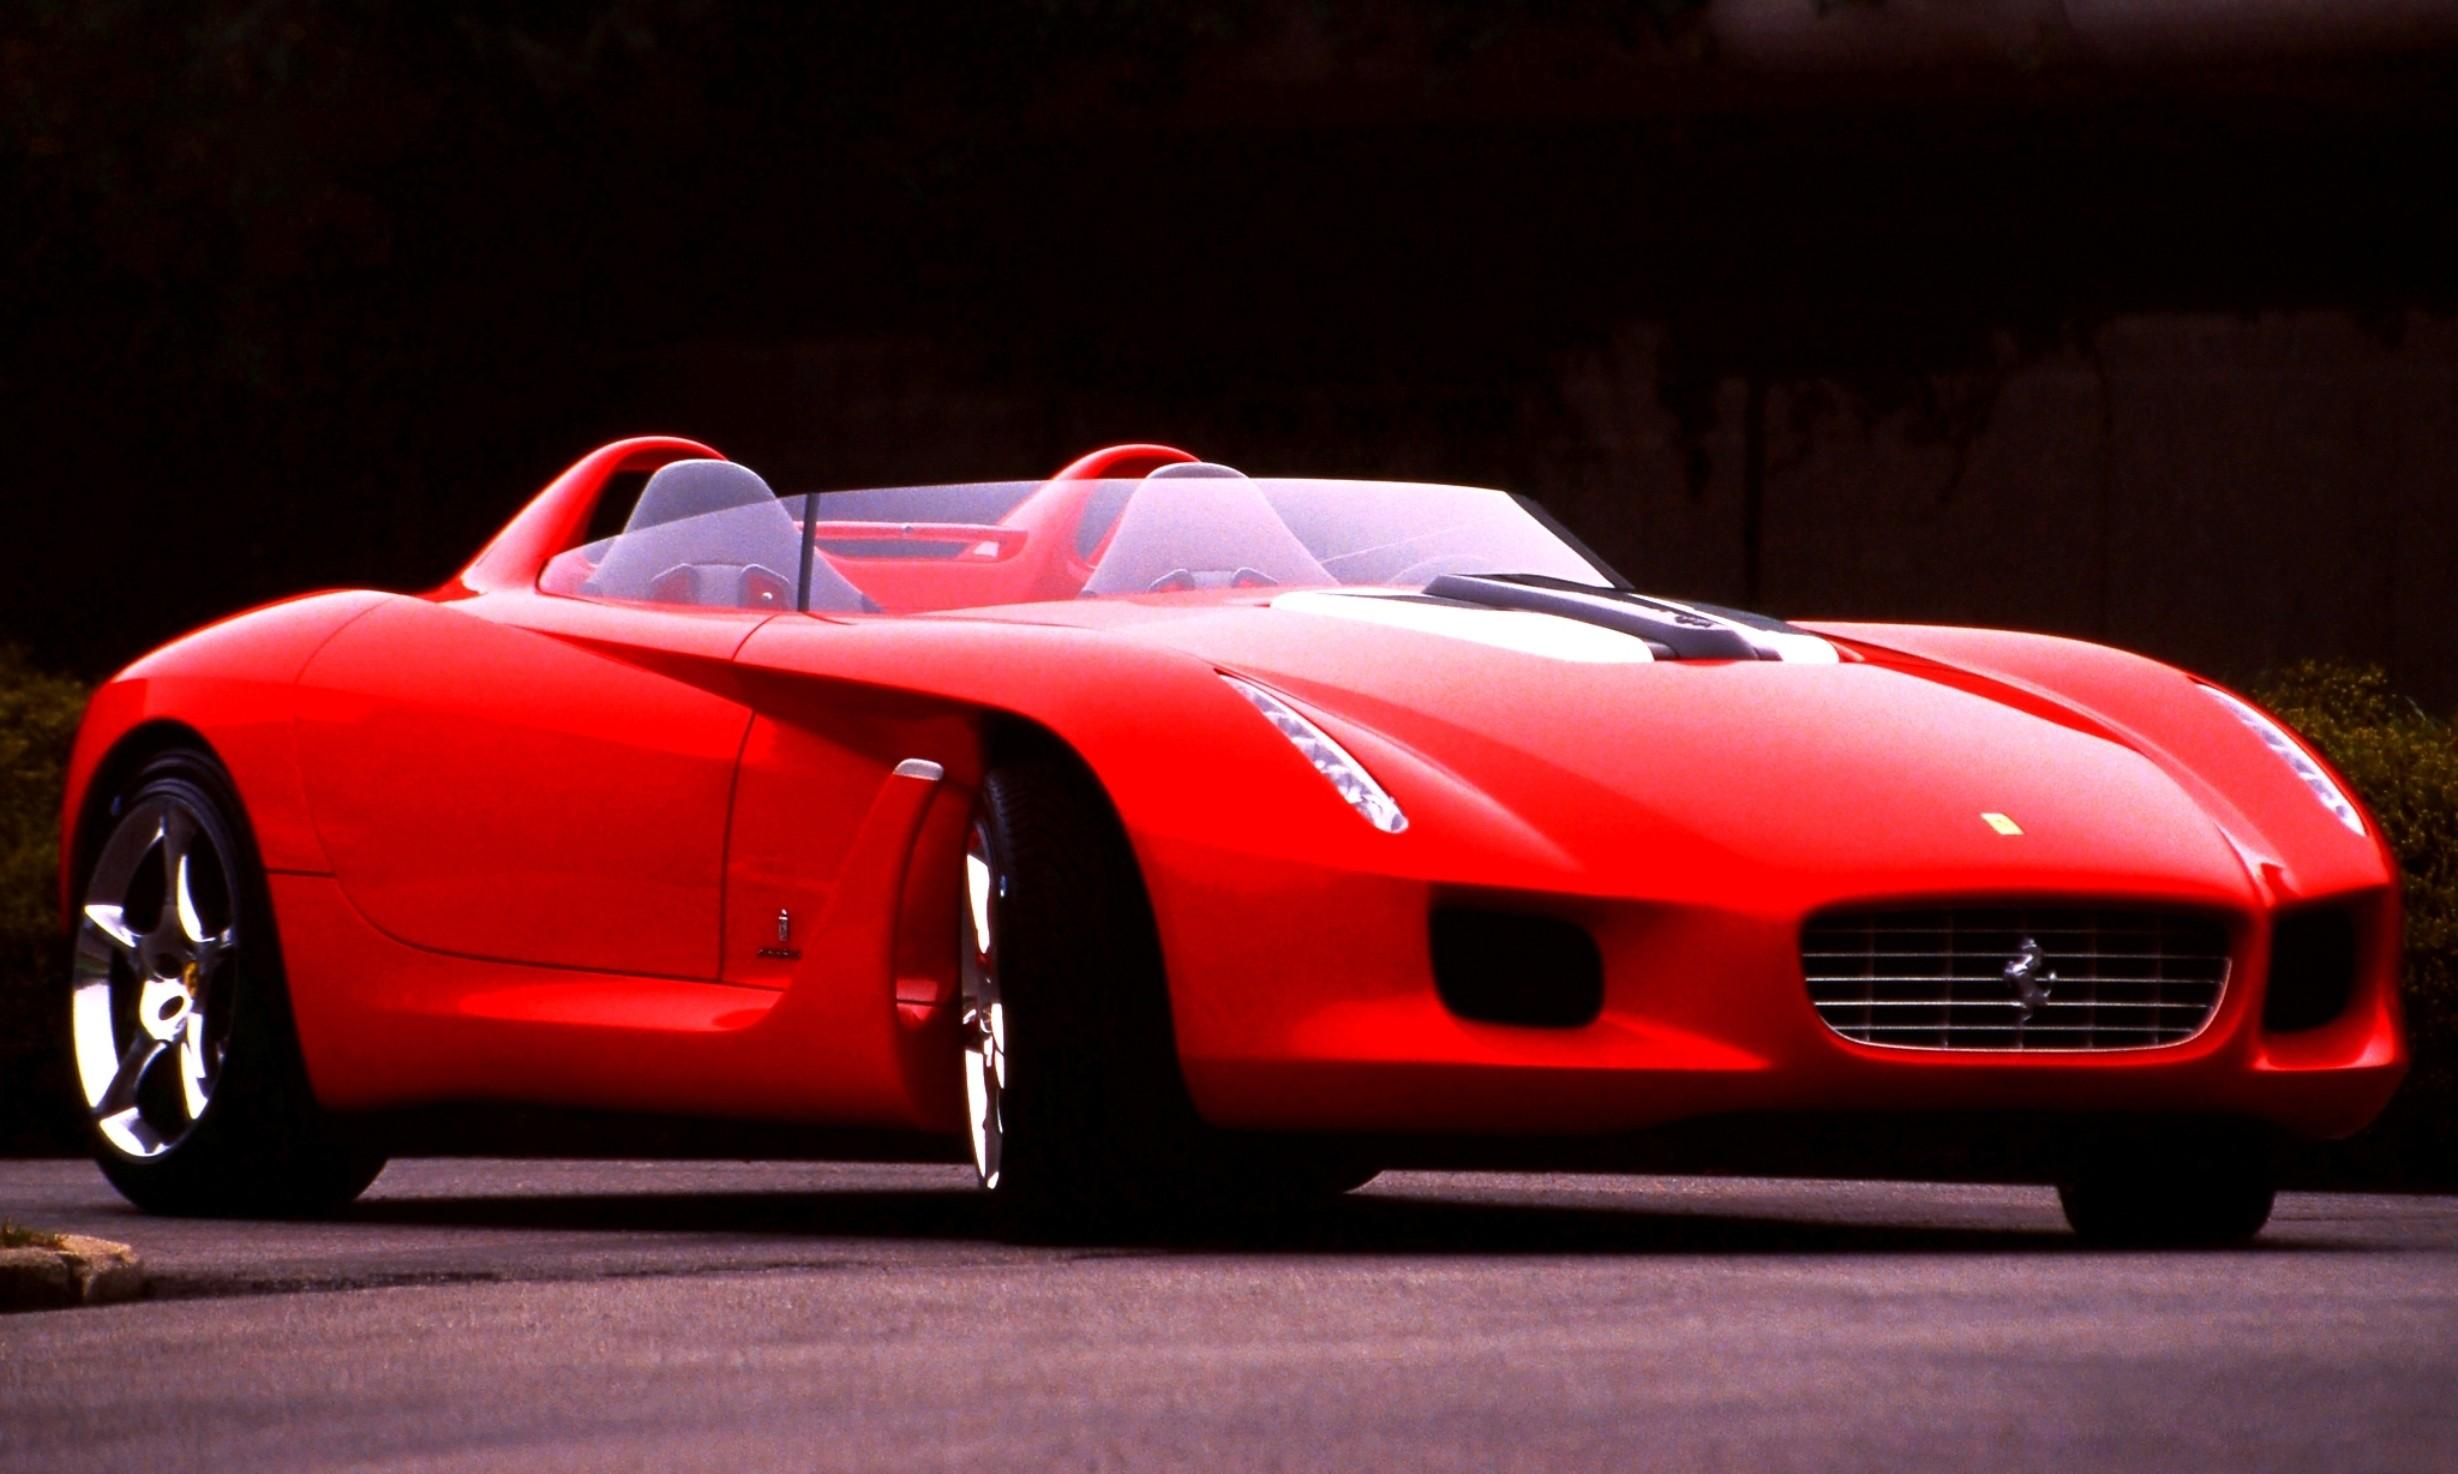 Concept Flashback - 2000 Ferrari Rossa Concept Speedster ...